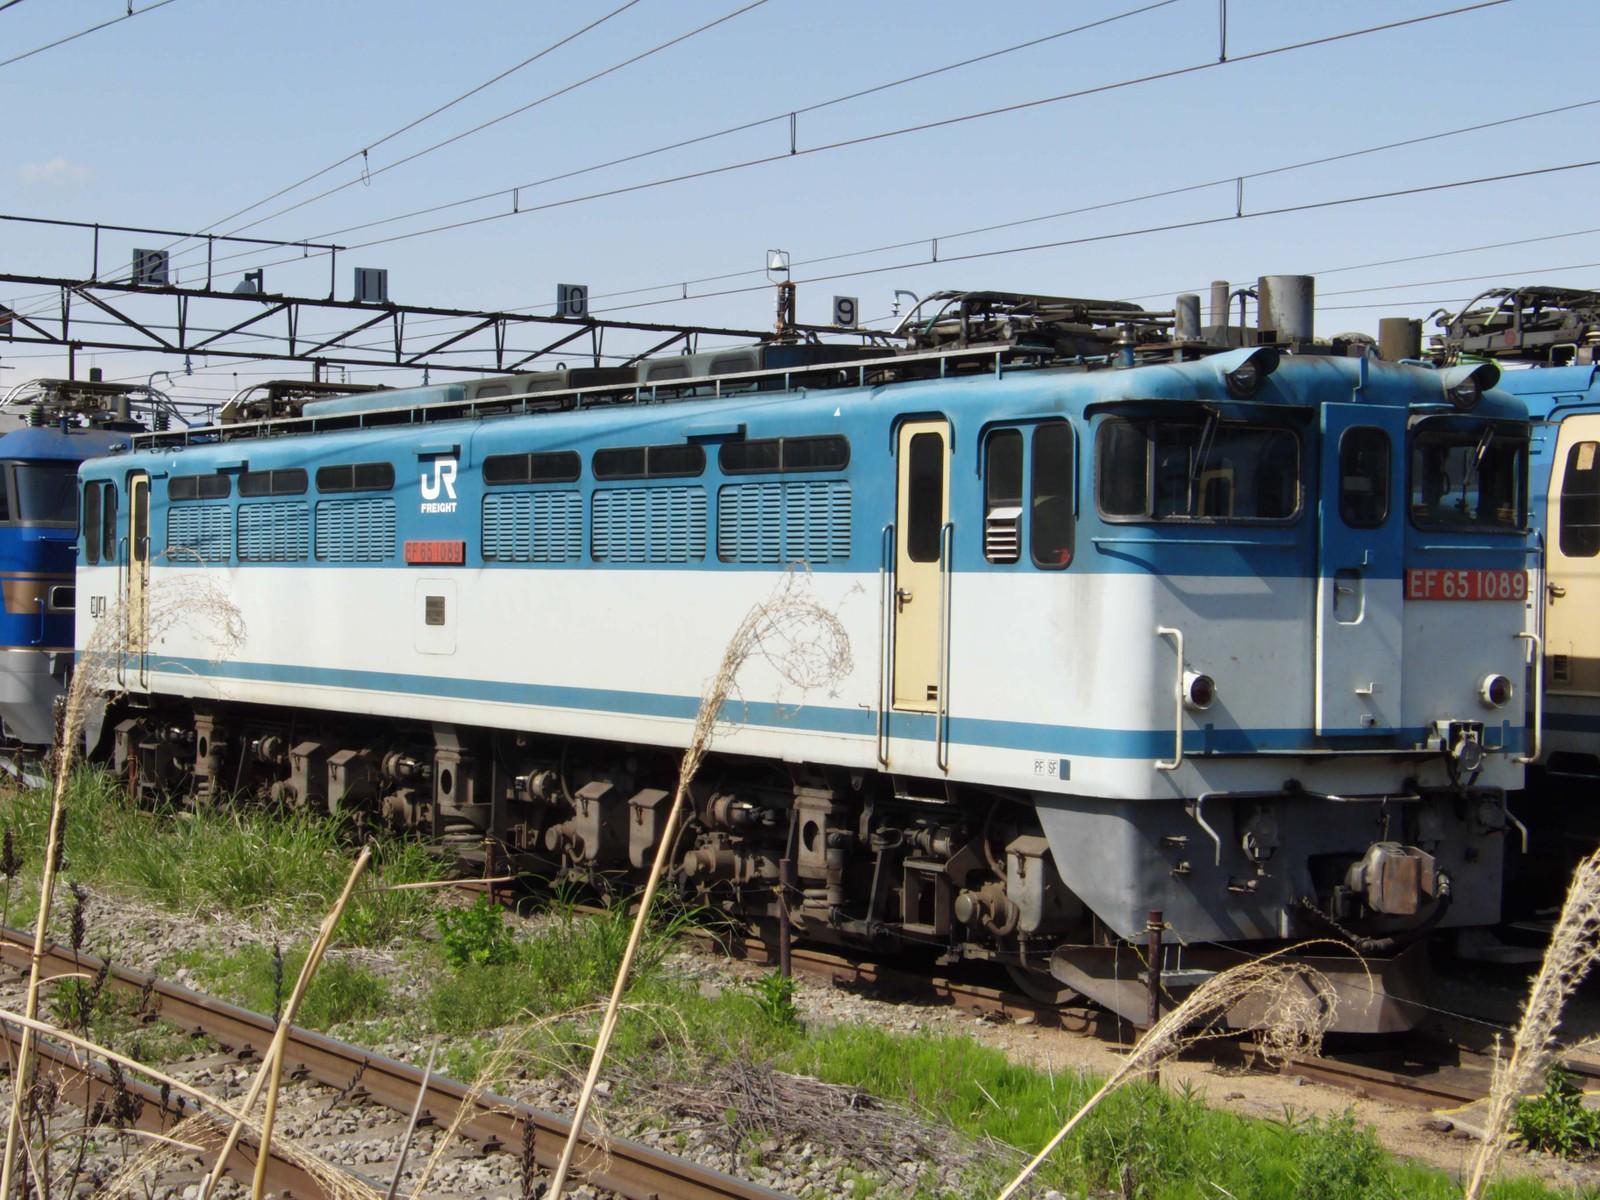 Ef651089